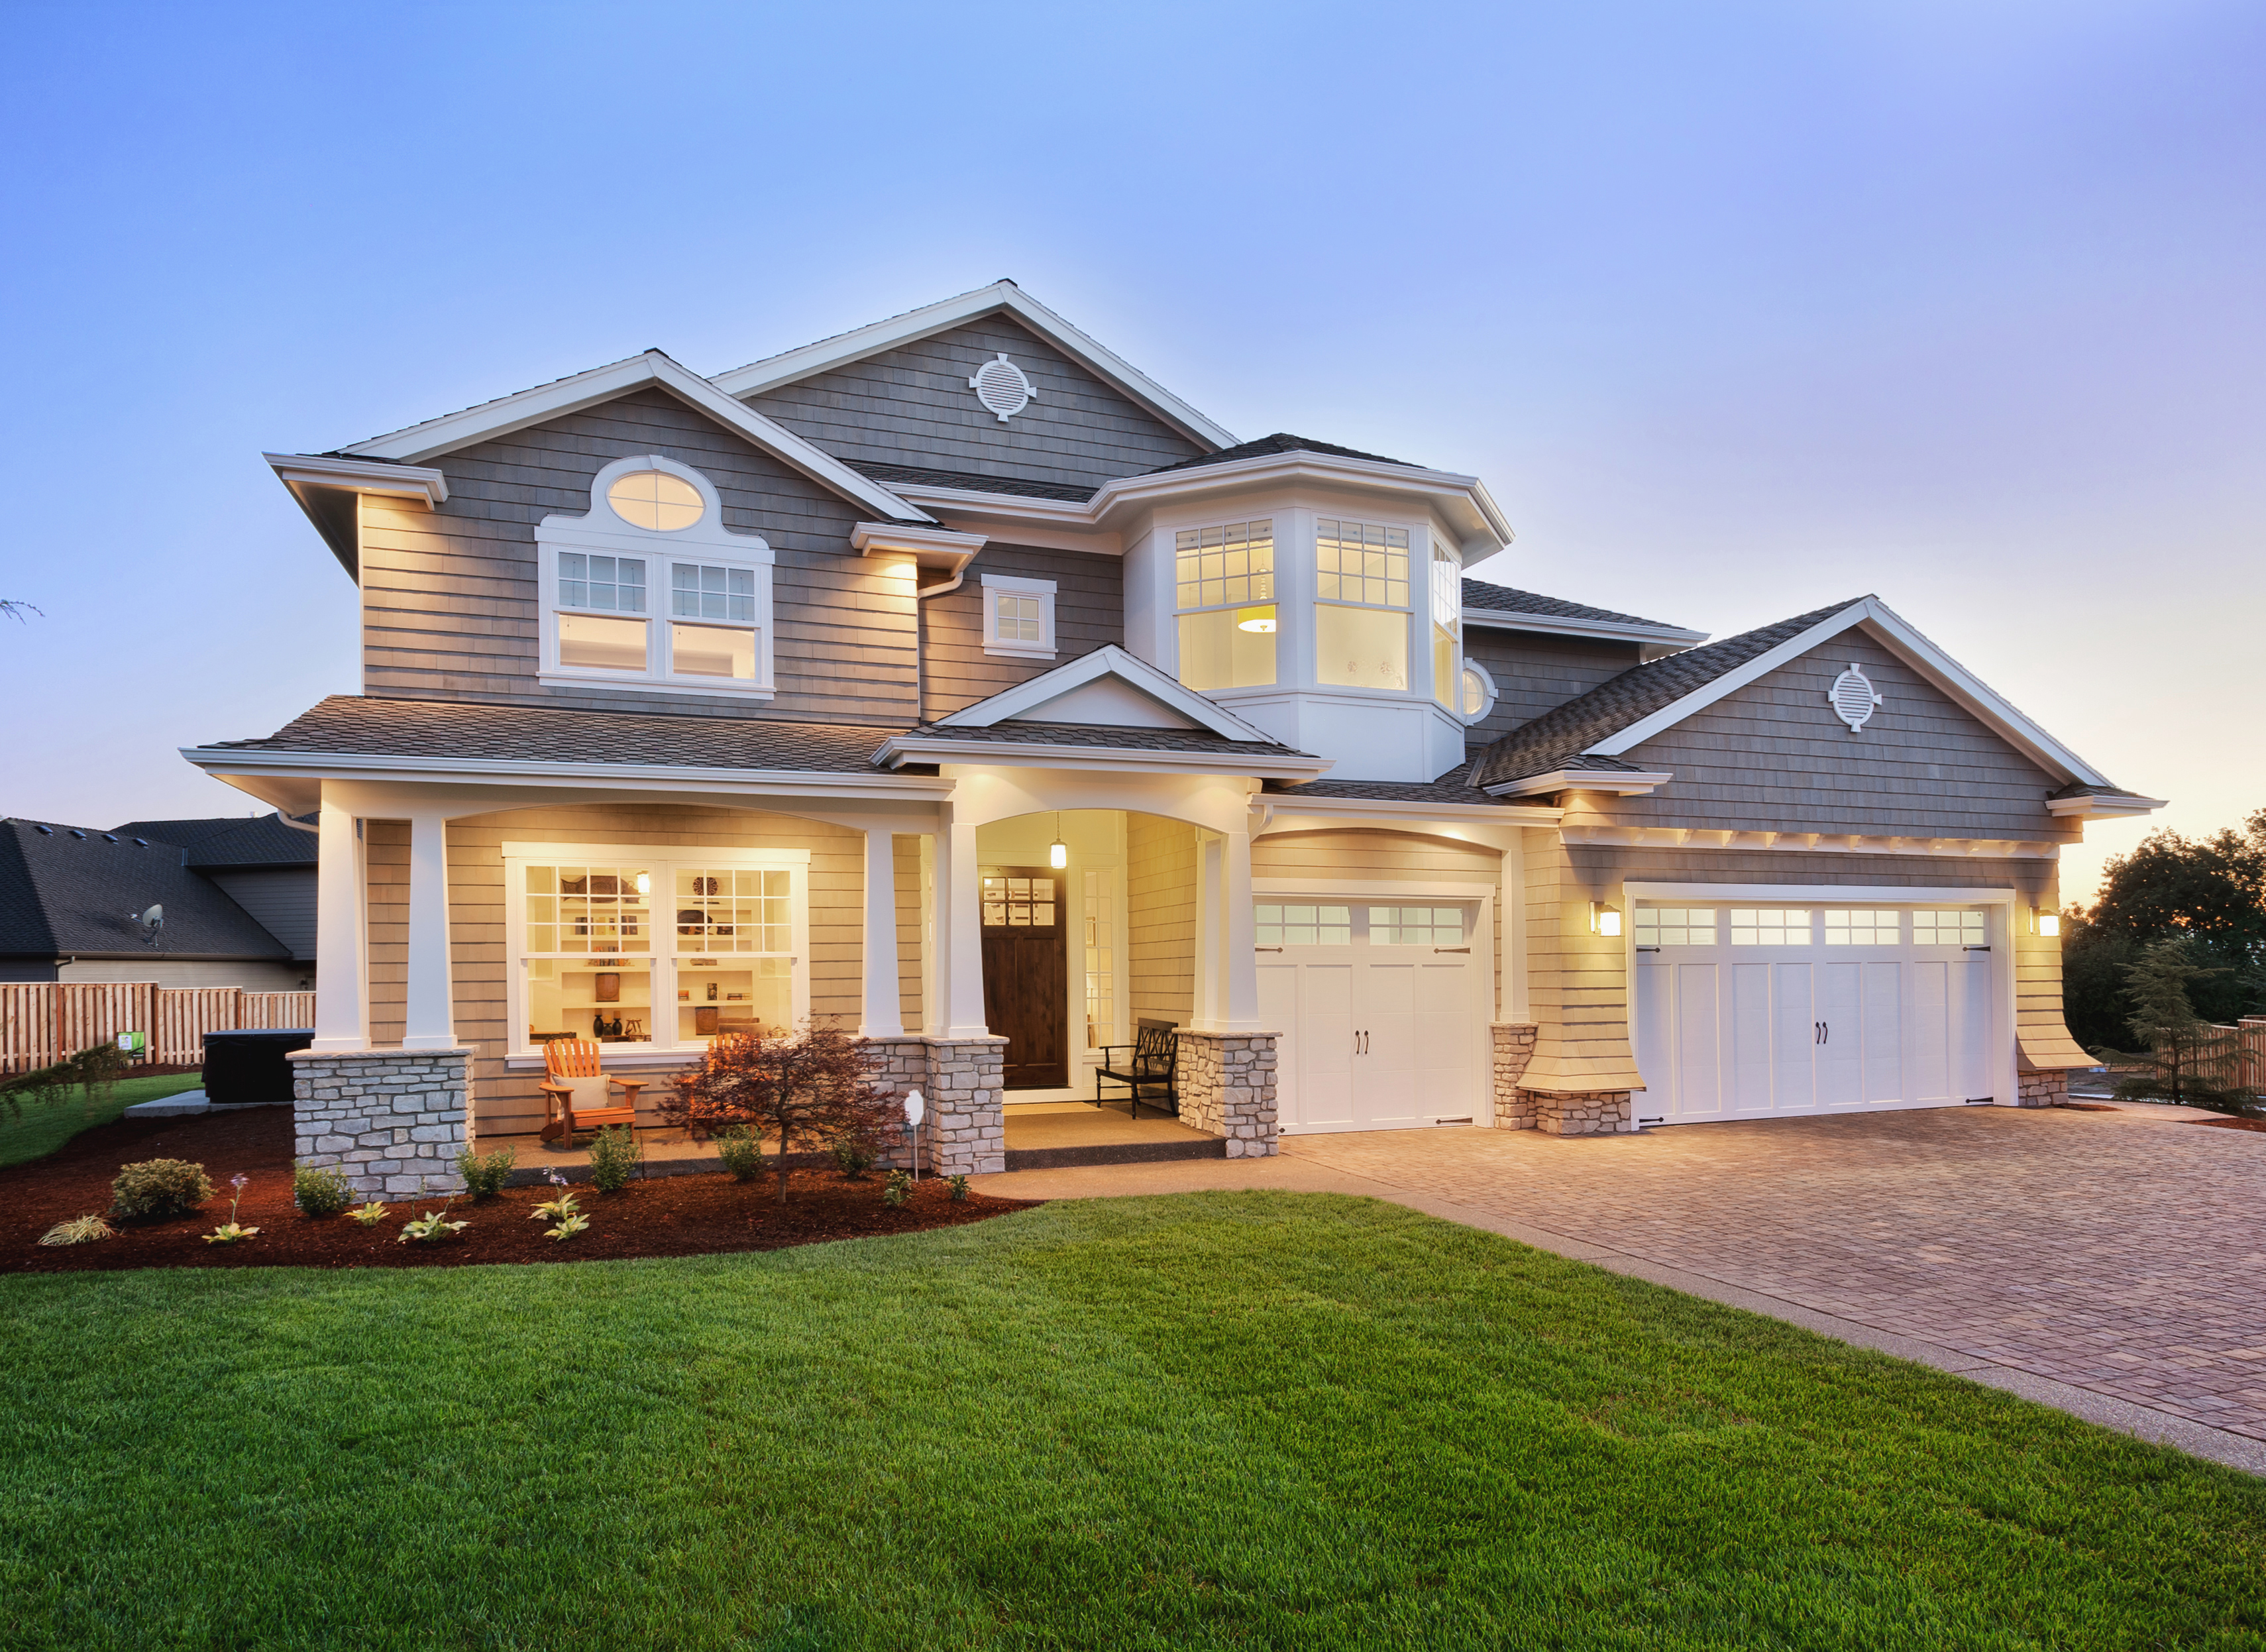 Explaining The Basis Of Inherited Real Estate Argi Financial Group